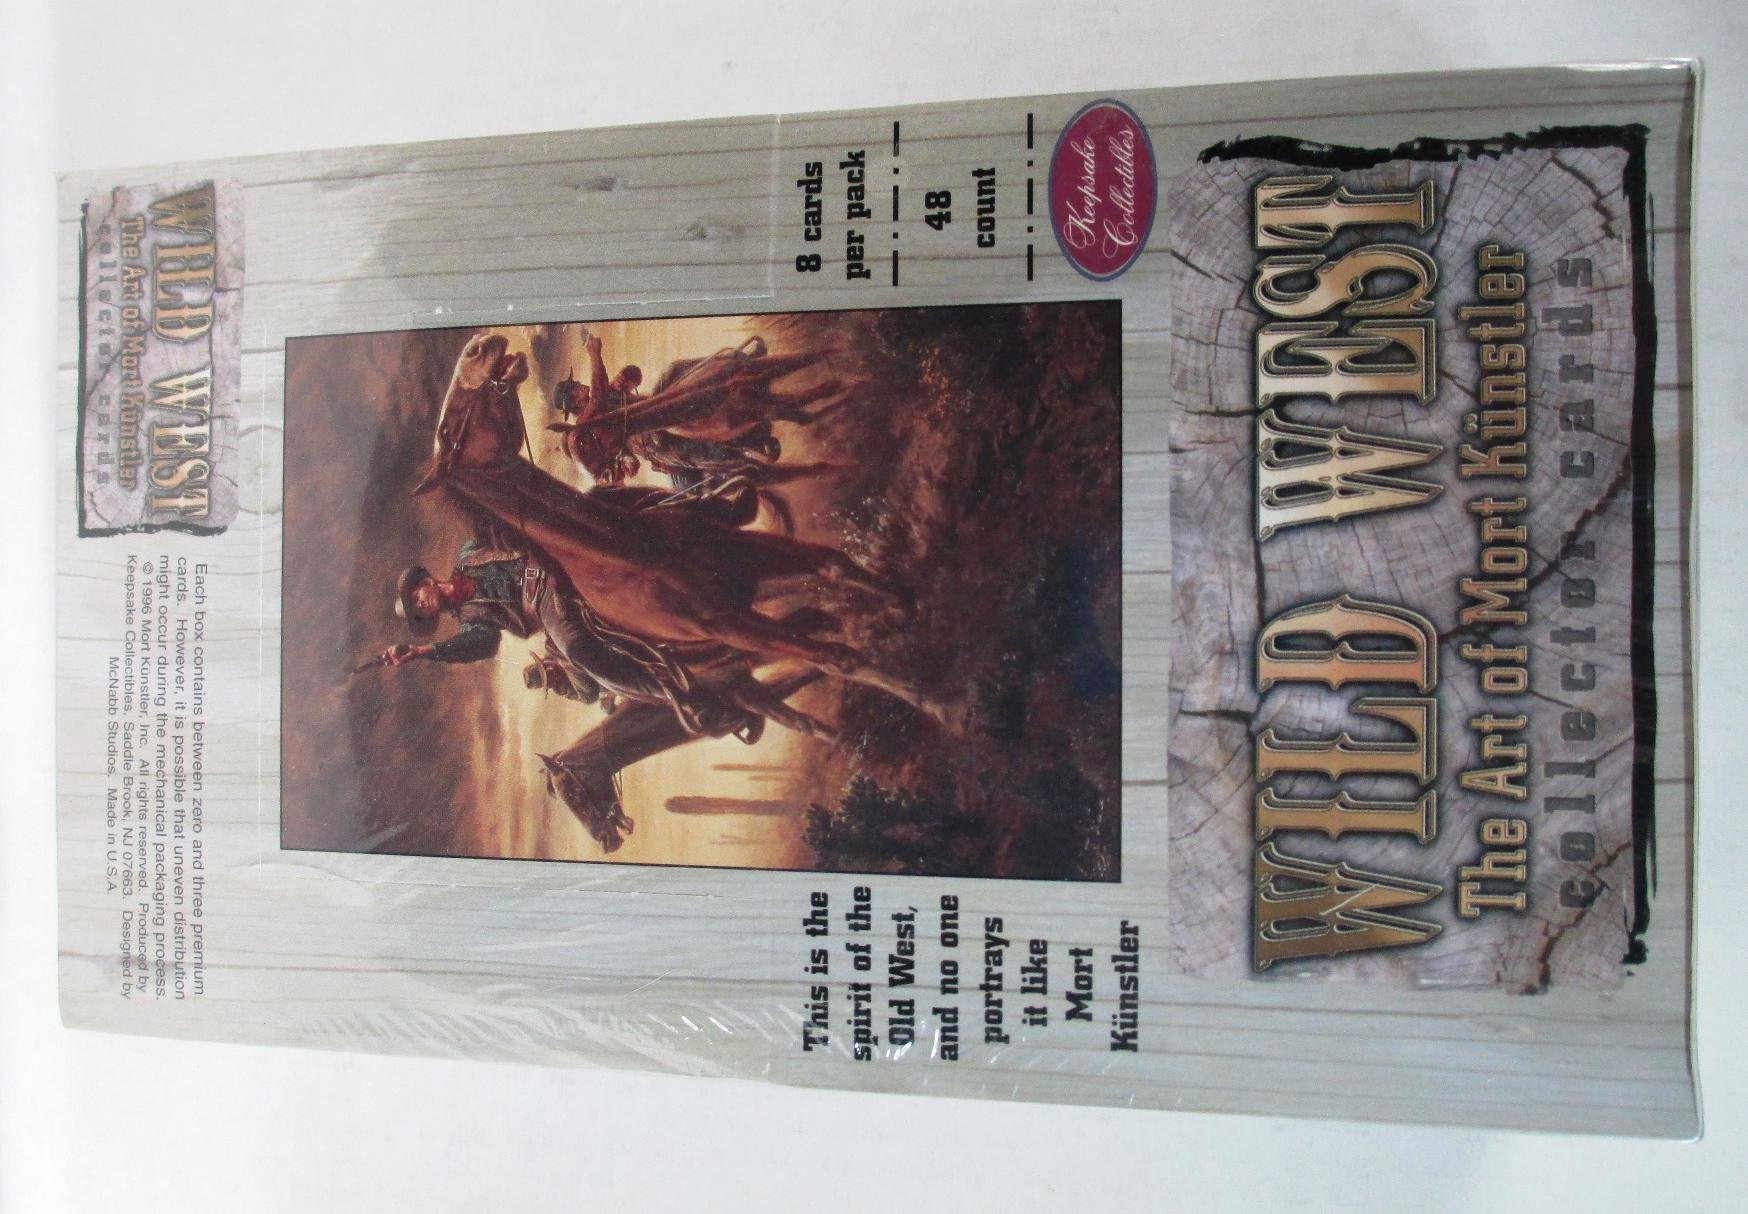 Wild West The Art of Mort Kunstler Trading Cards Box Set - 48 Packs by Mort Kunstler